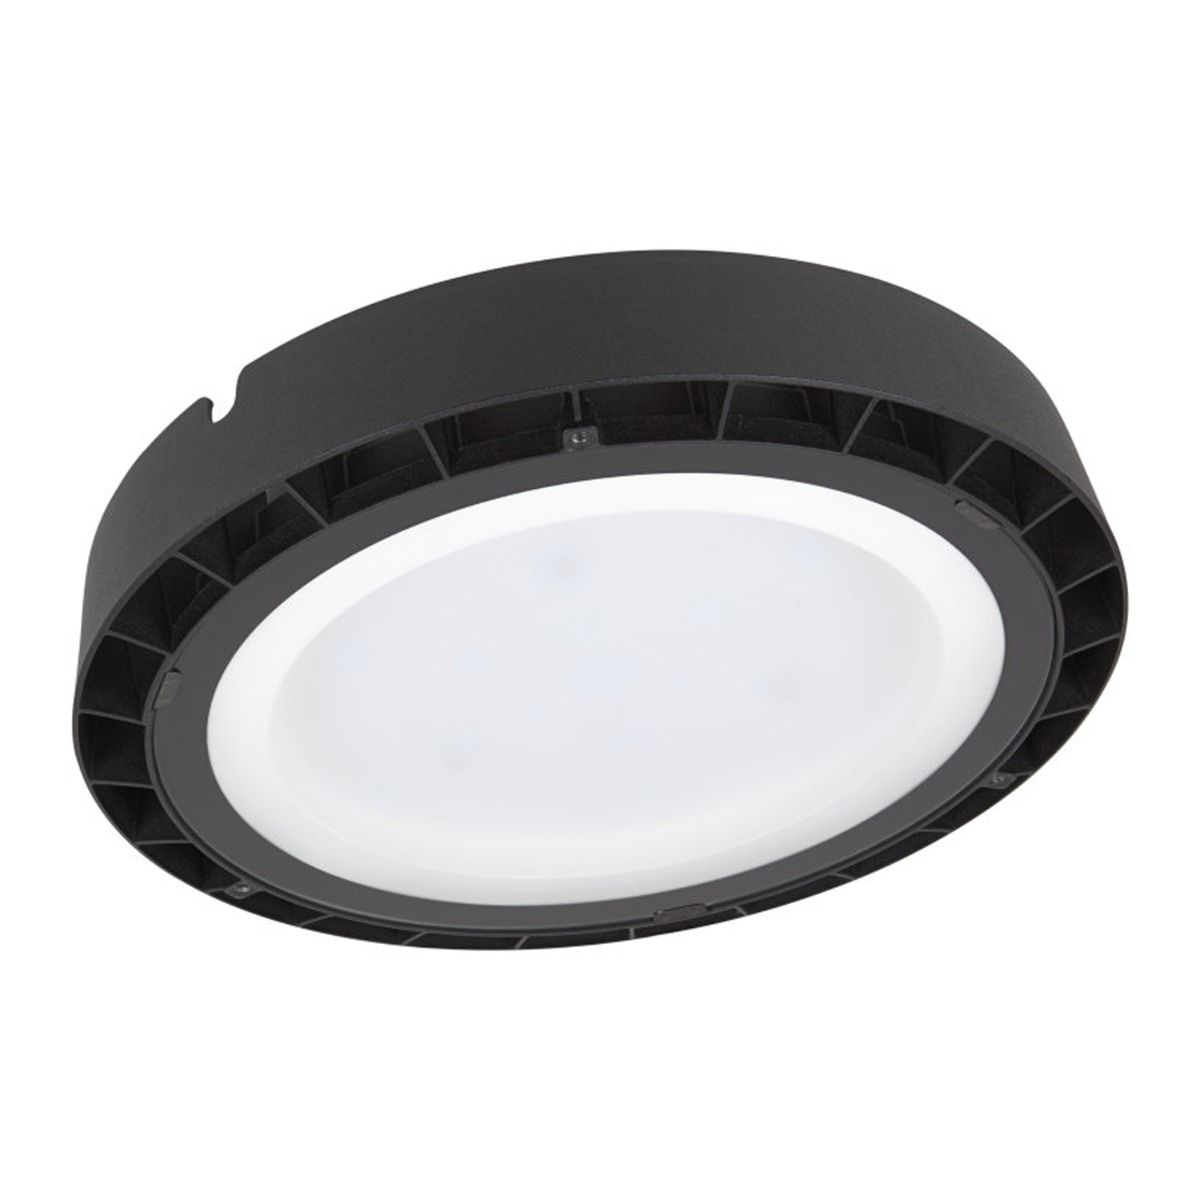 Lampada industriale LED Ledvance Value 200W 4000K IP65 20000lm 100D | Bianco Freddo - Sostituto 400W | A tenuta stagna